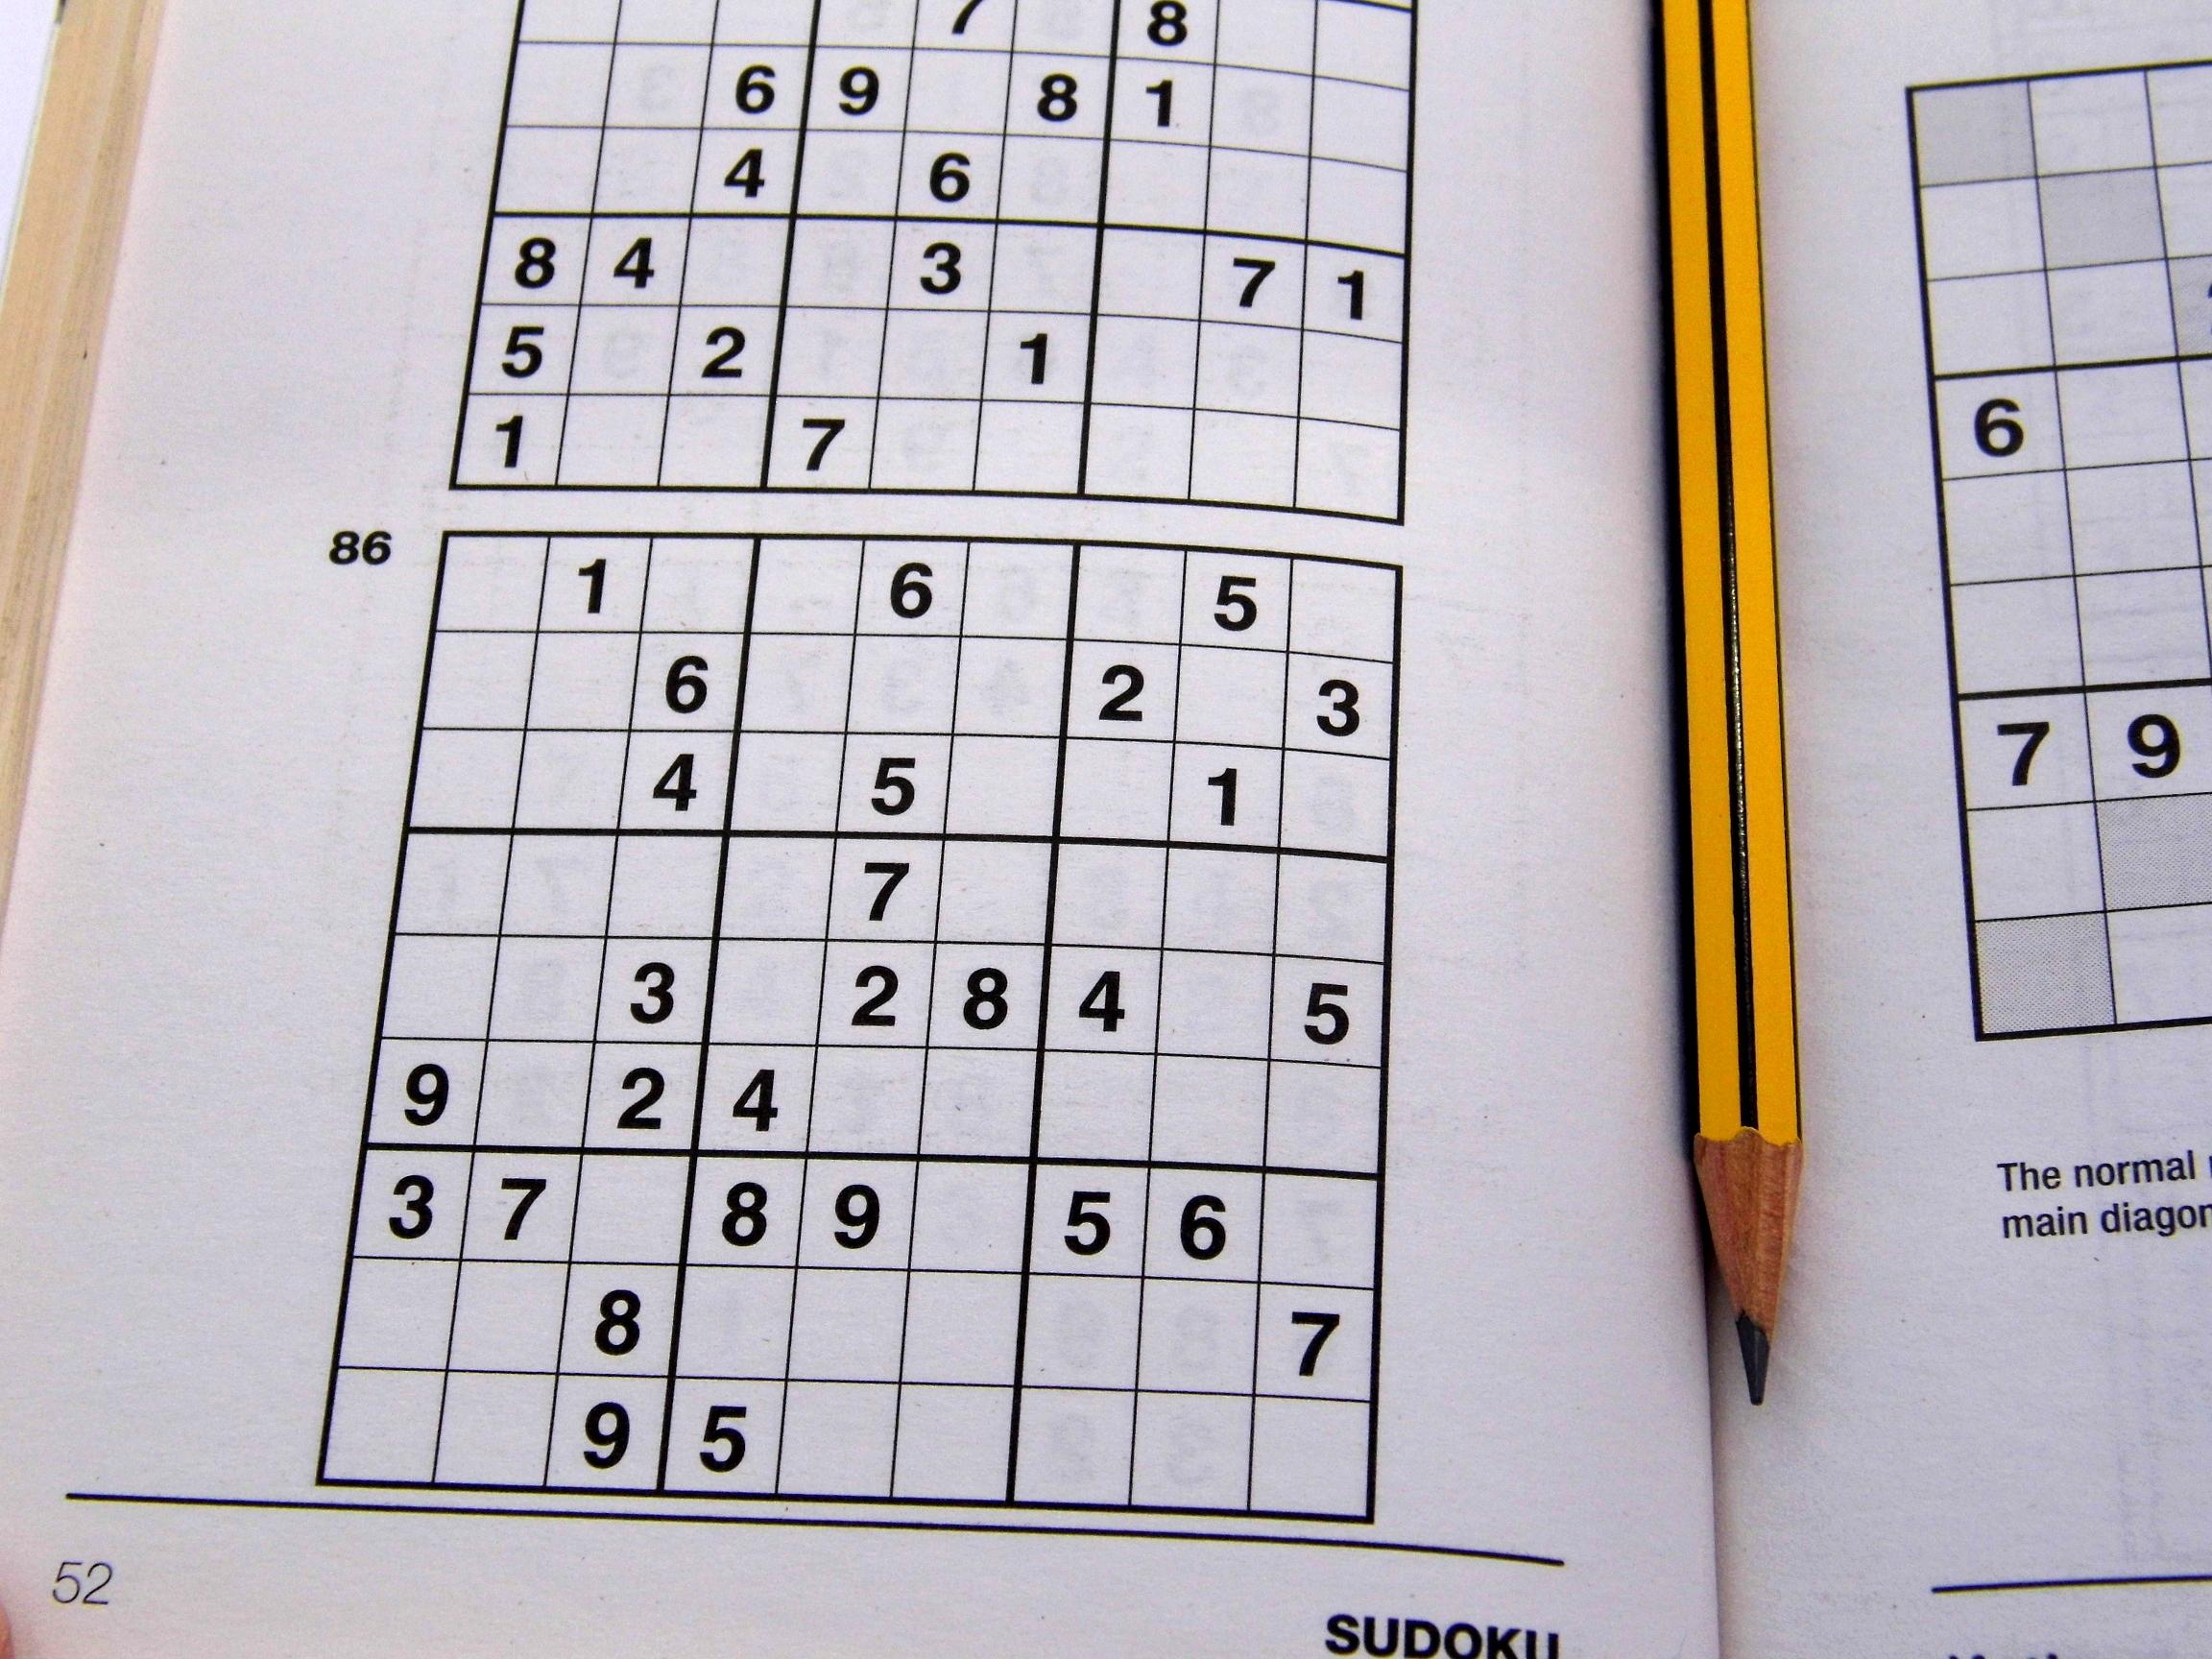 Easy Printable Sudoku Puzzles 2 Per Page – Book 2 – Free Sudoku Puzzles - Printable Sudoku Puzzles 2 Per Page